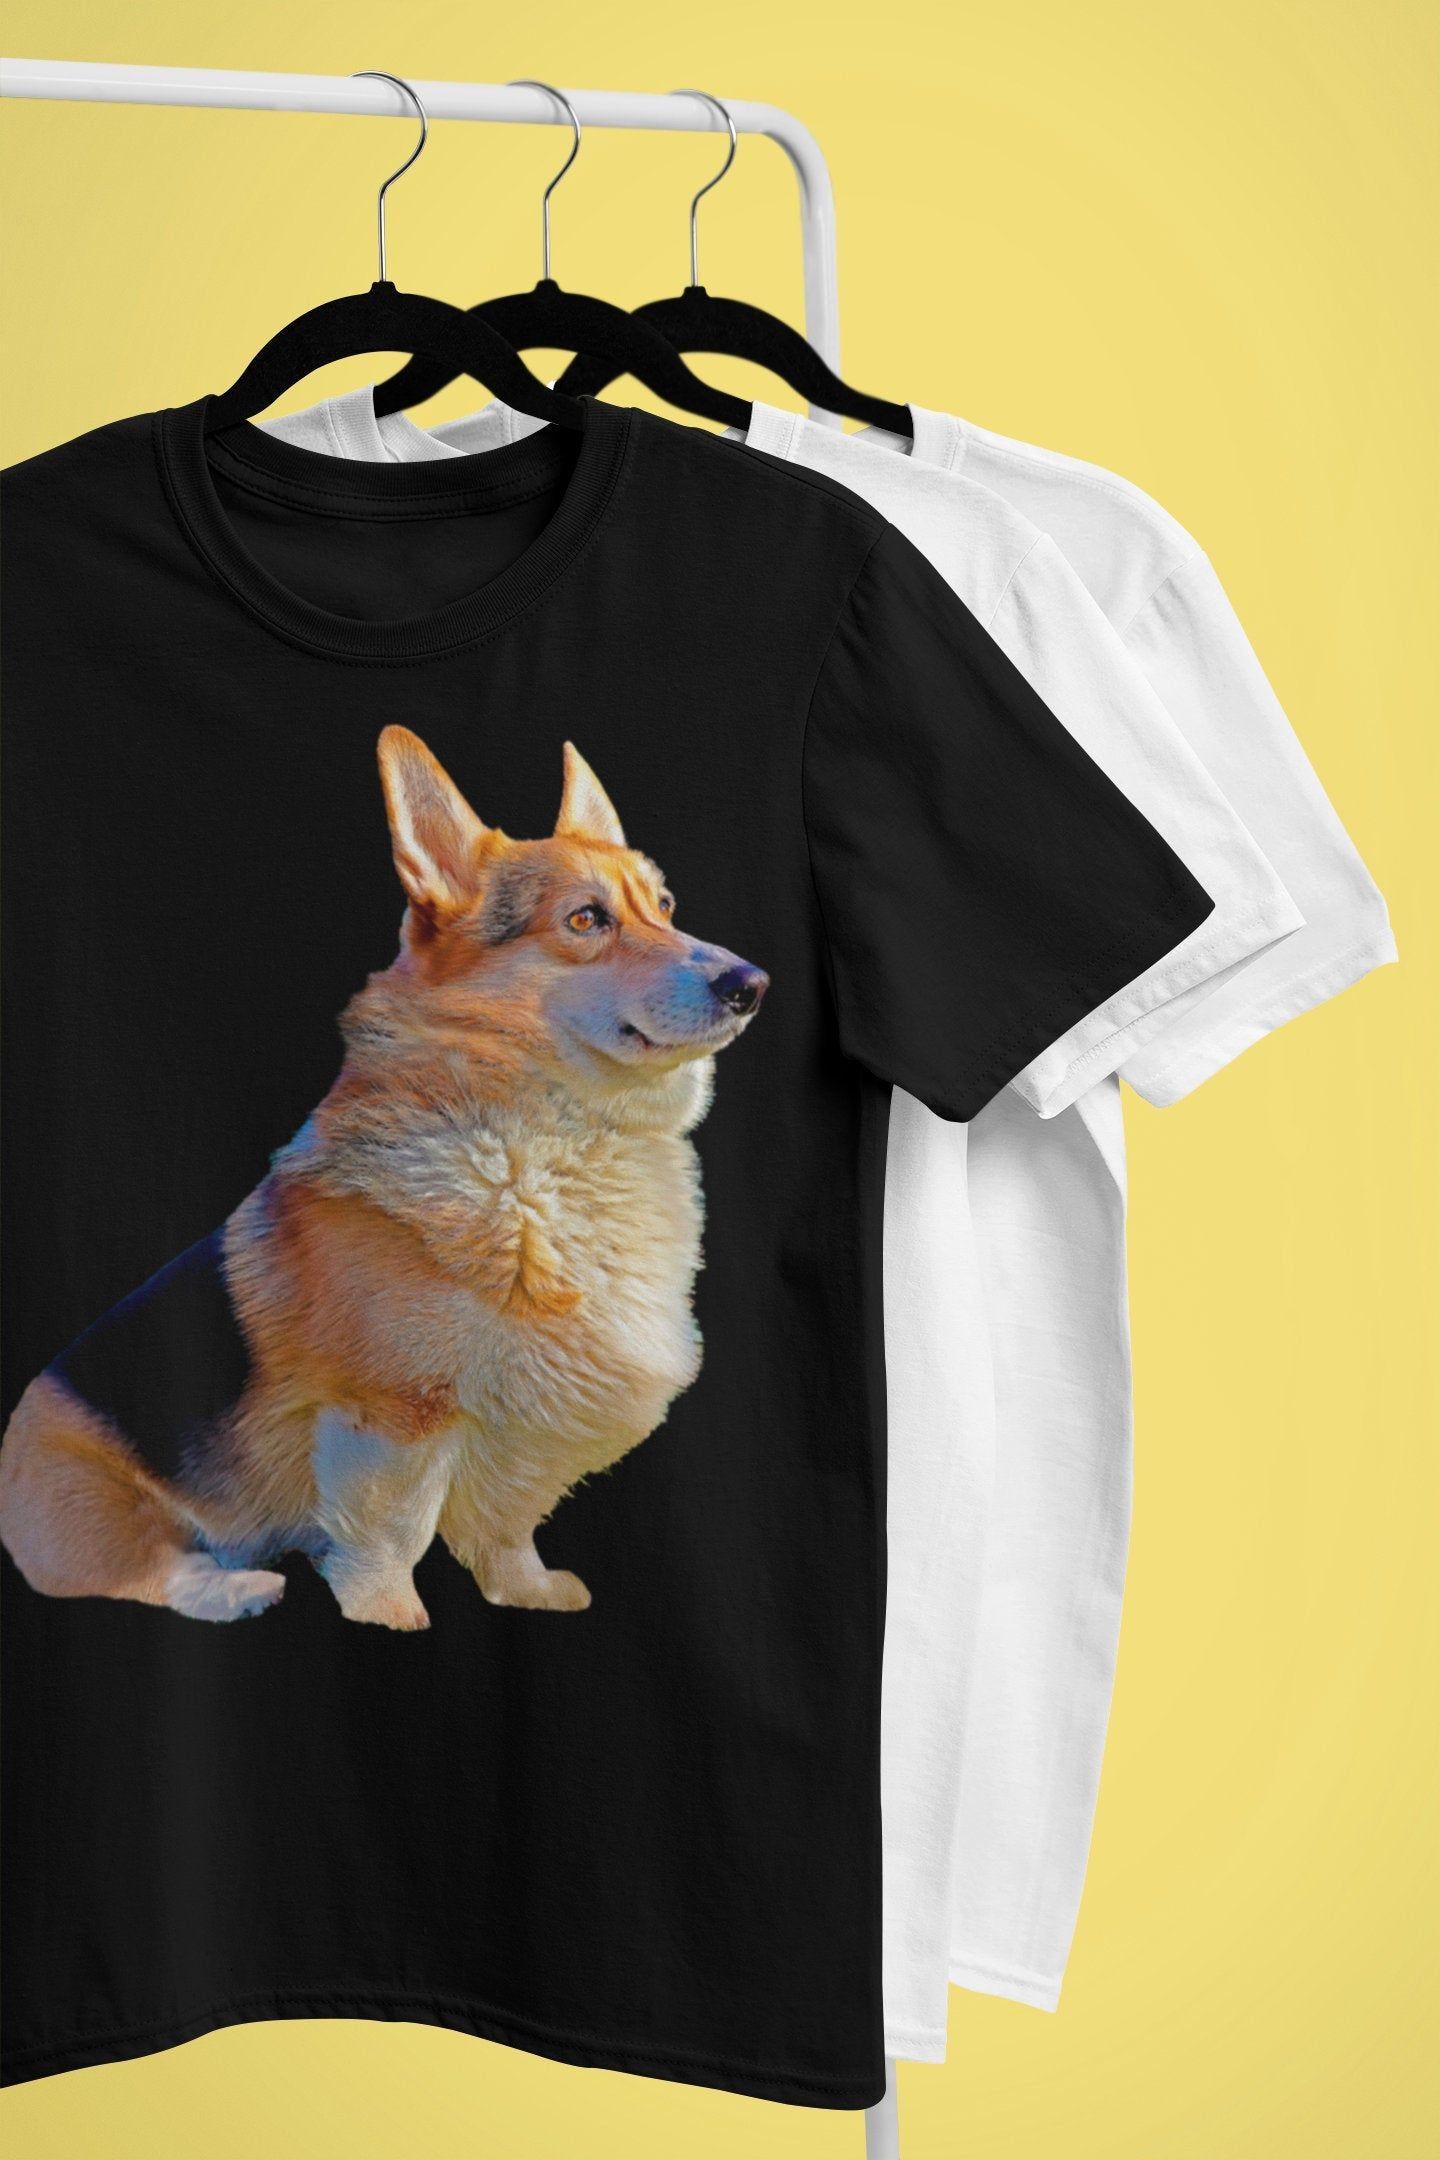 Cardigan Welsh Corgi Puppies For Sale In Nj Ideas